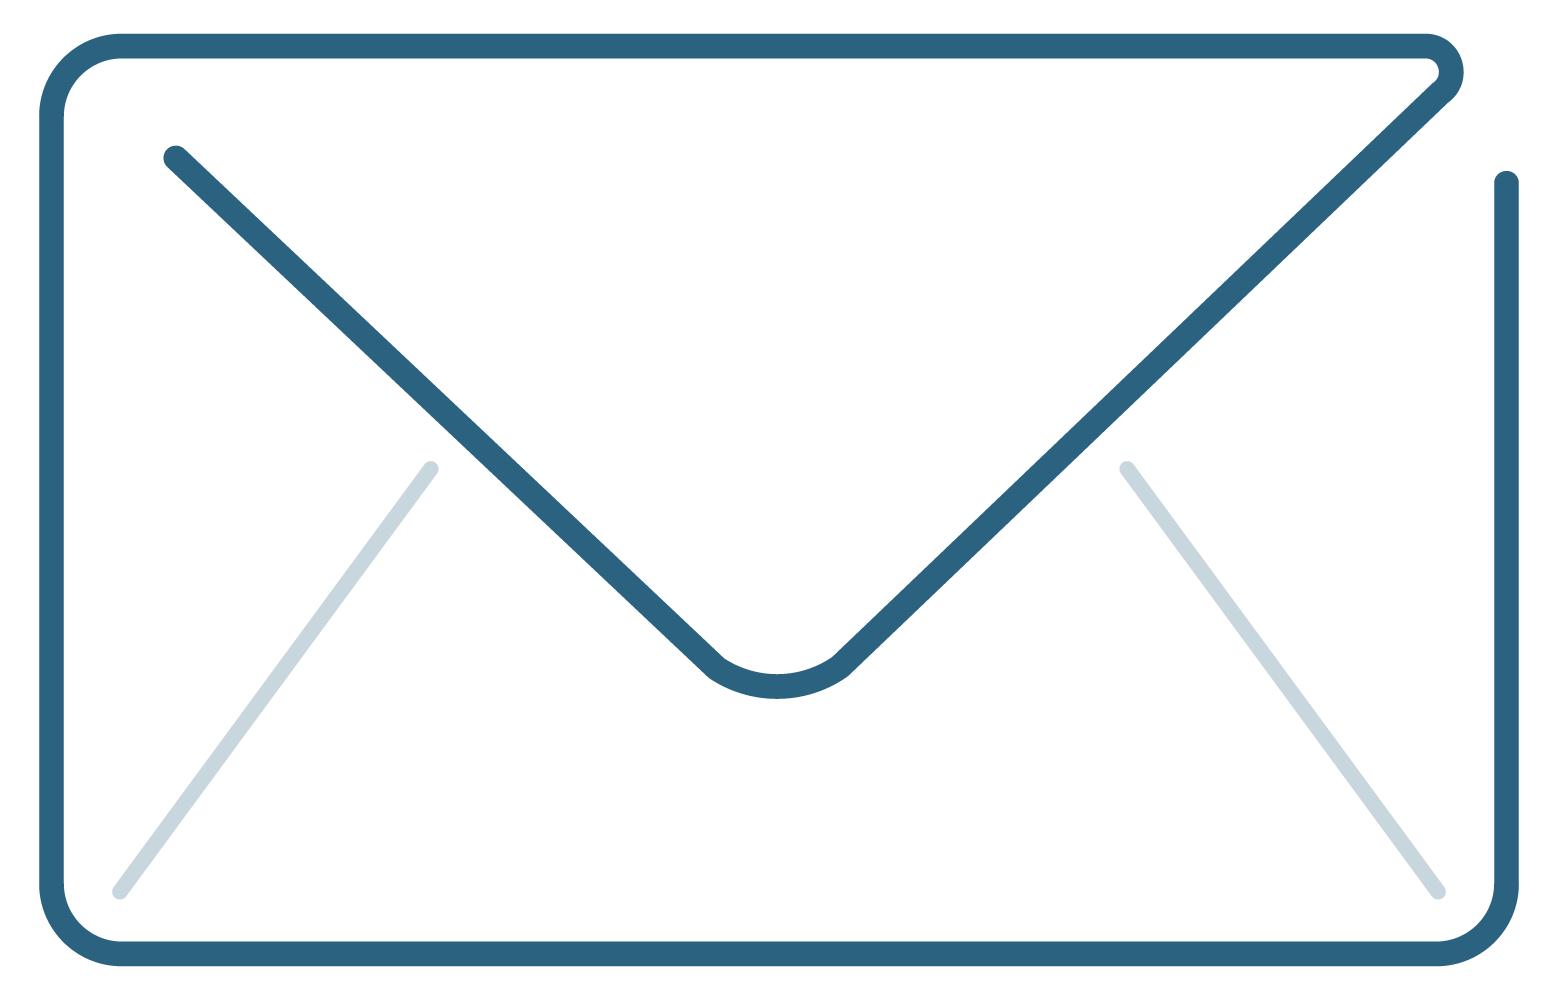 Contact envelope icon